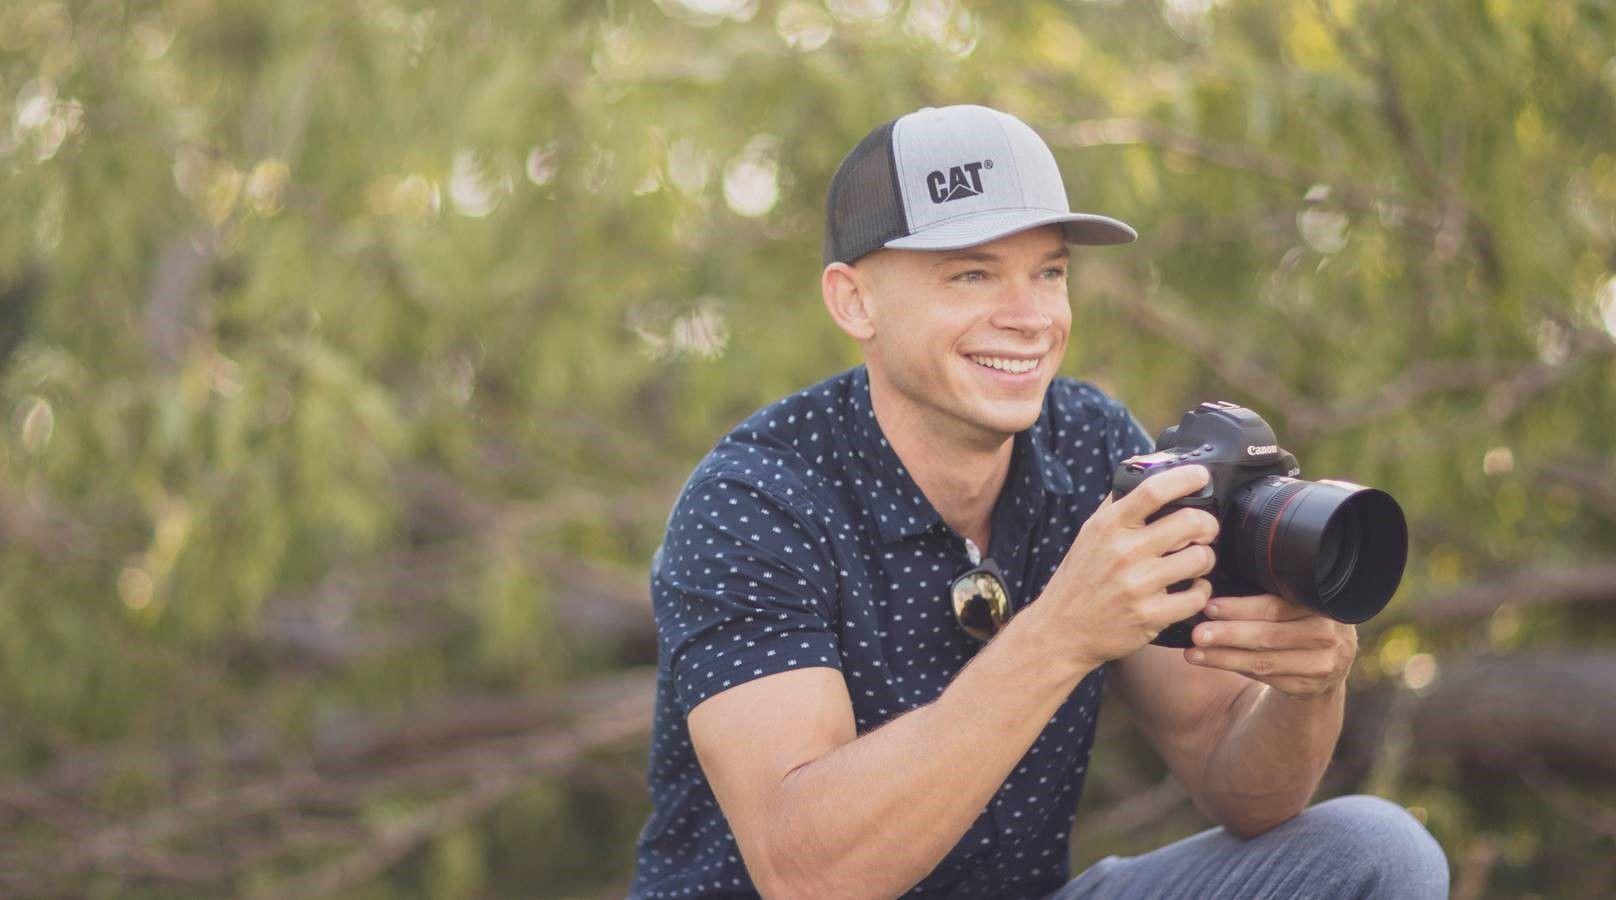 Nick Pflederer - Caterpillar Photographer